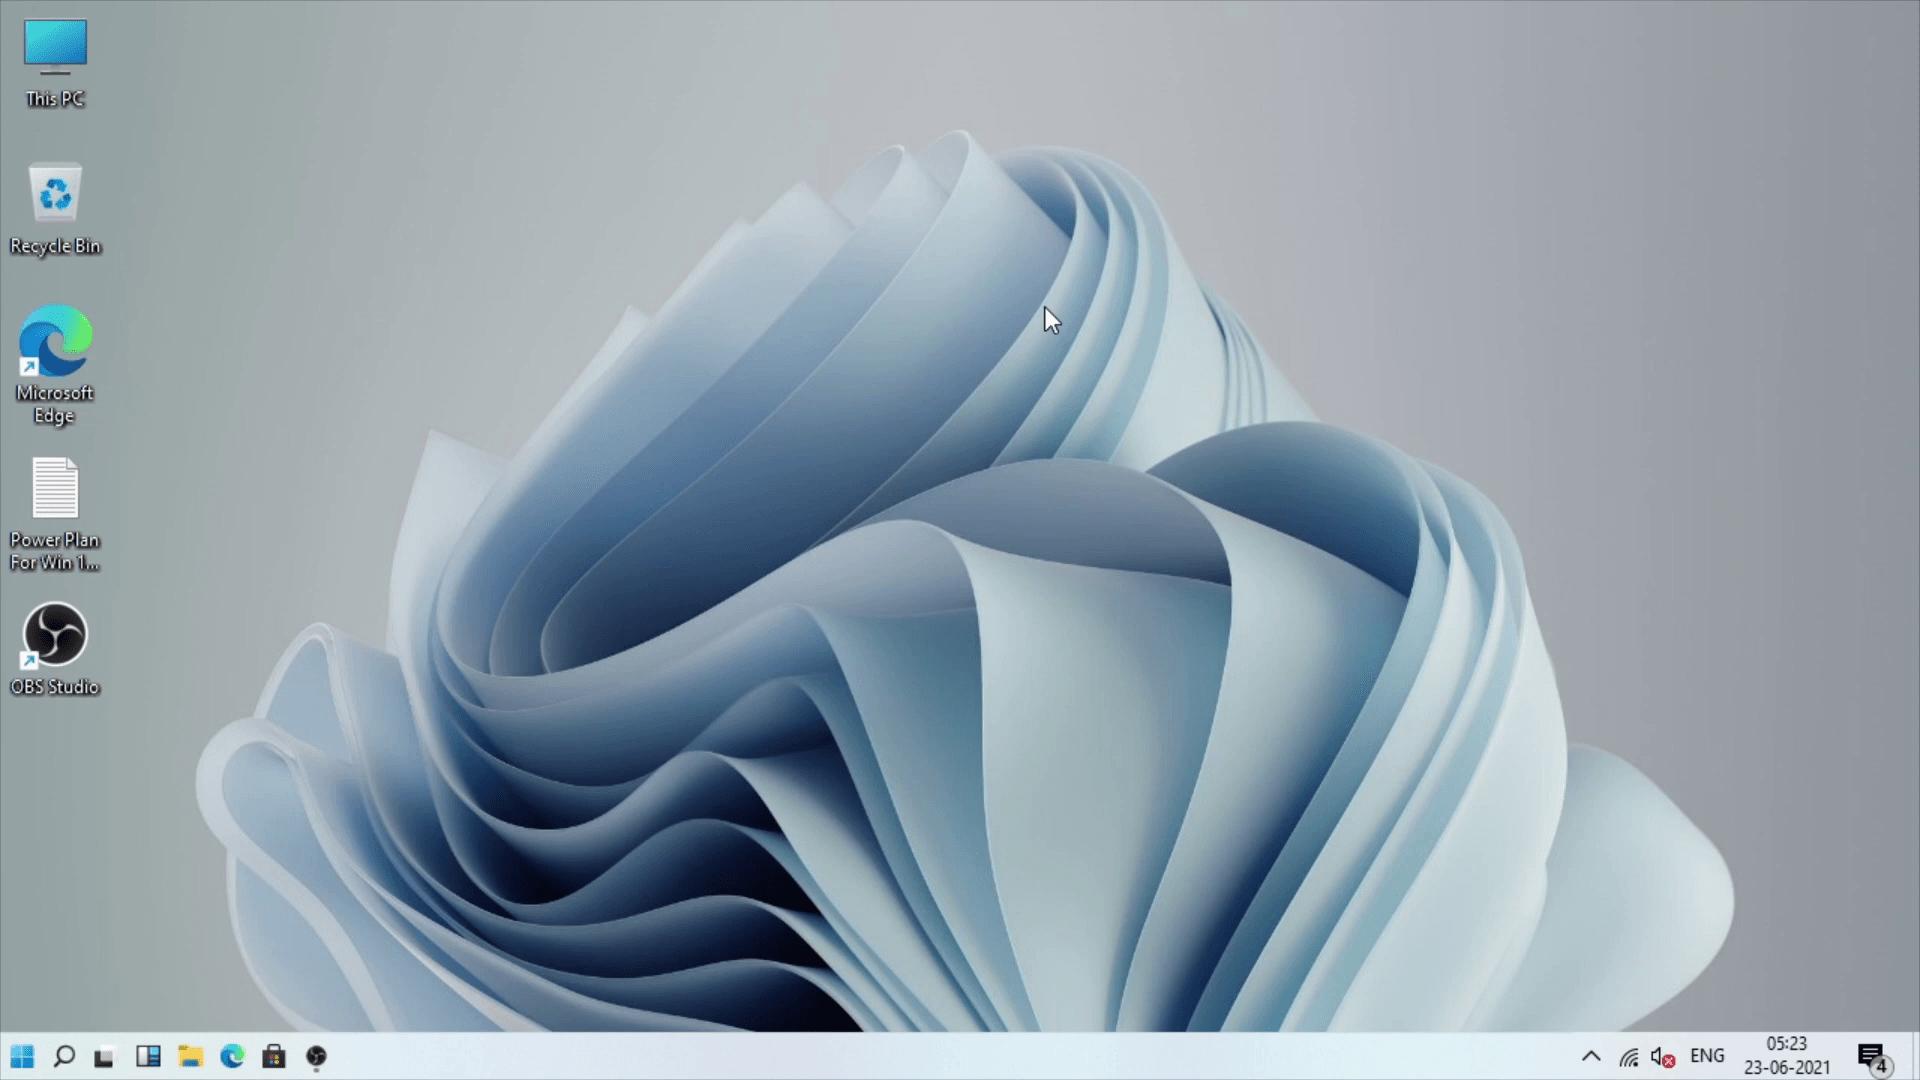 Windows 11 Small taskbar